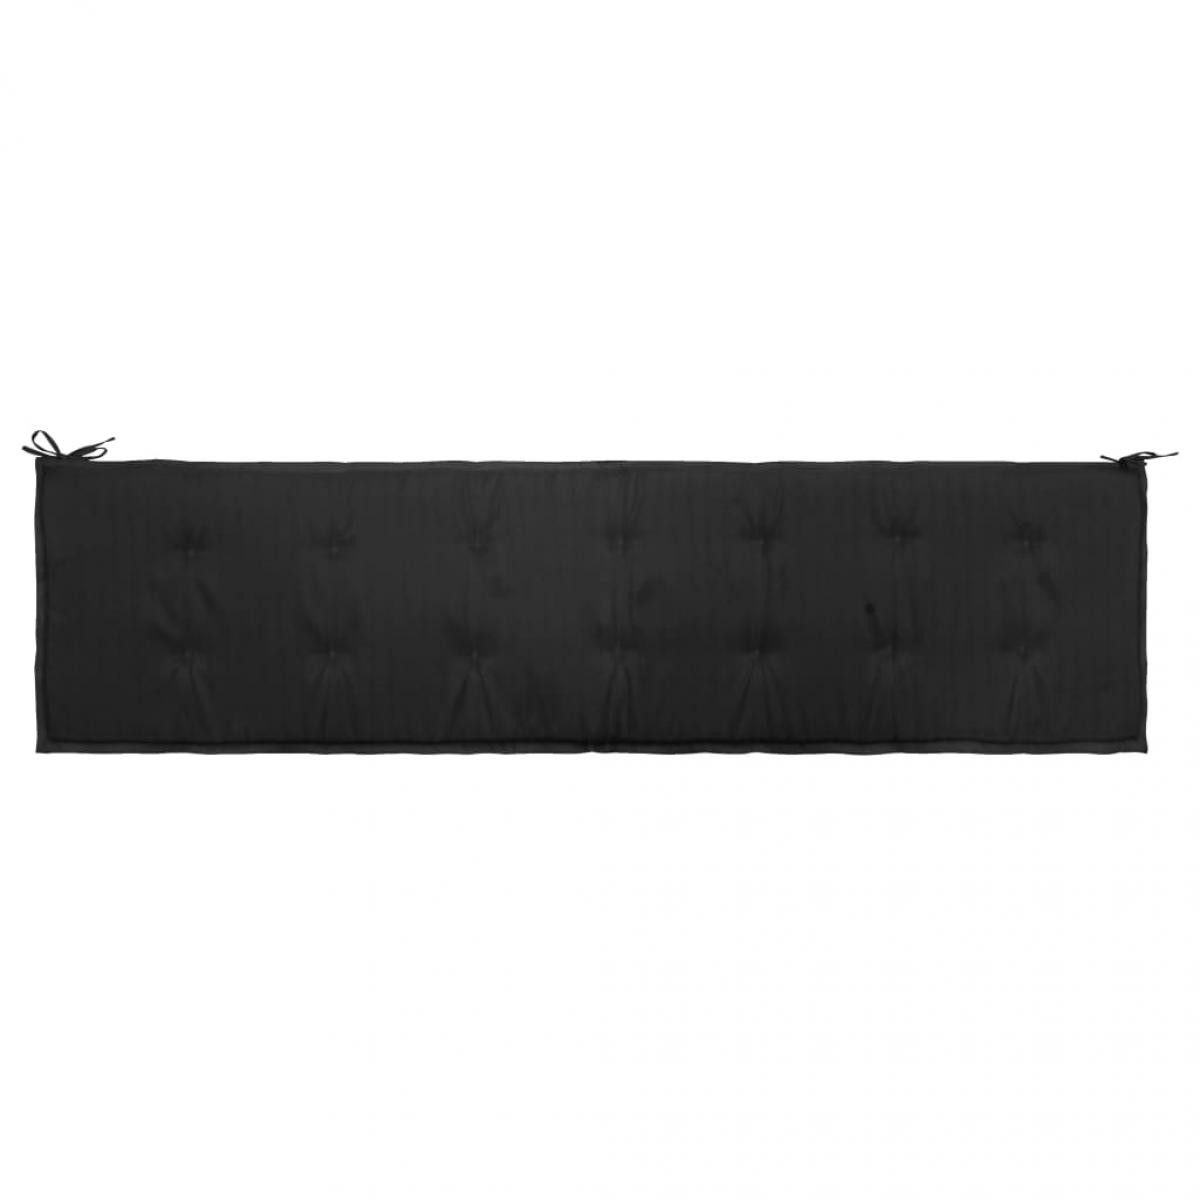 Vidaxl vidaXL Coussin de banc de jardin Noir 200 x 50 x 3 cm